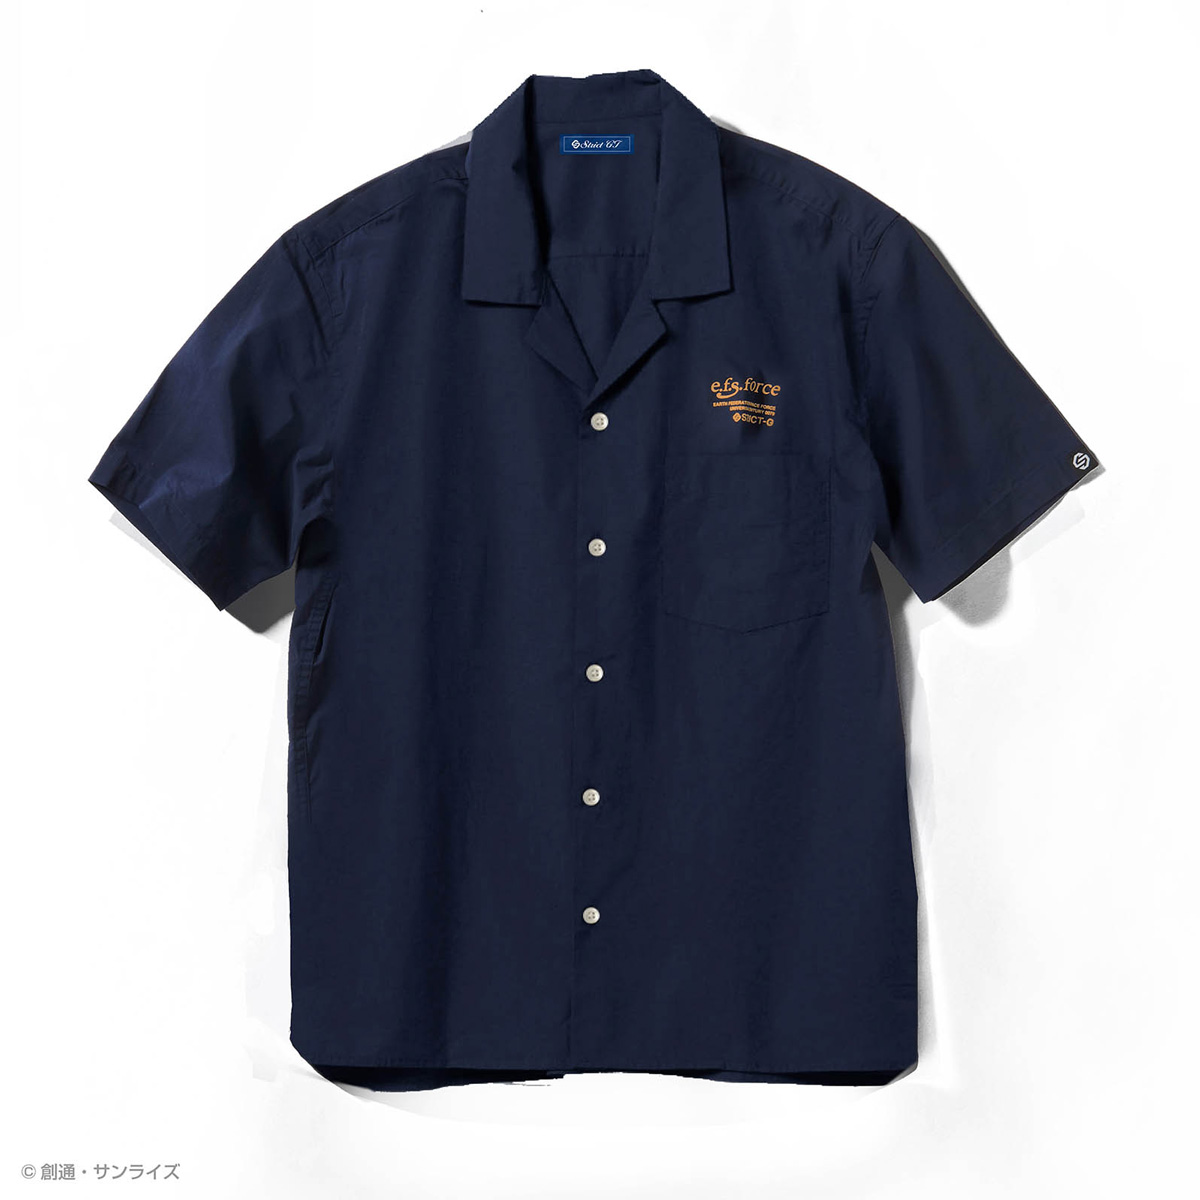 STRICT-G『機動戦士ガンダム』 クールマックス 半袖オープンカラーPt.シャツ E.F.S.F.